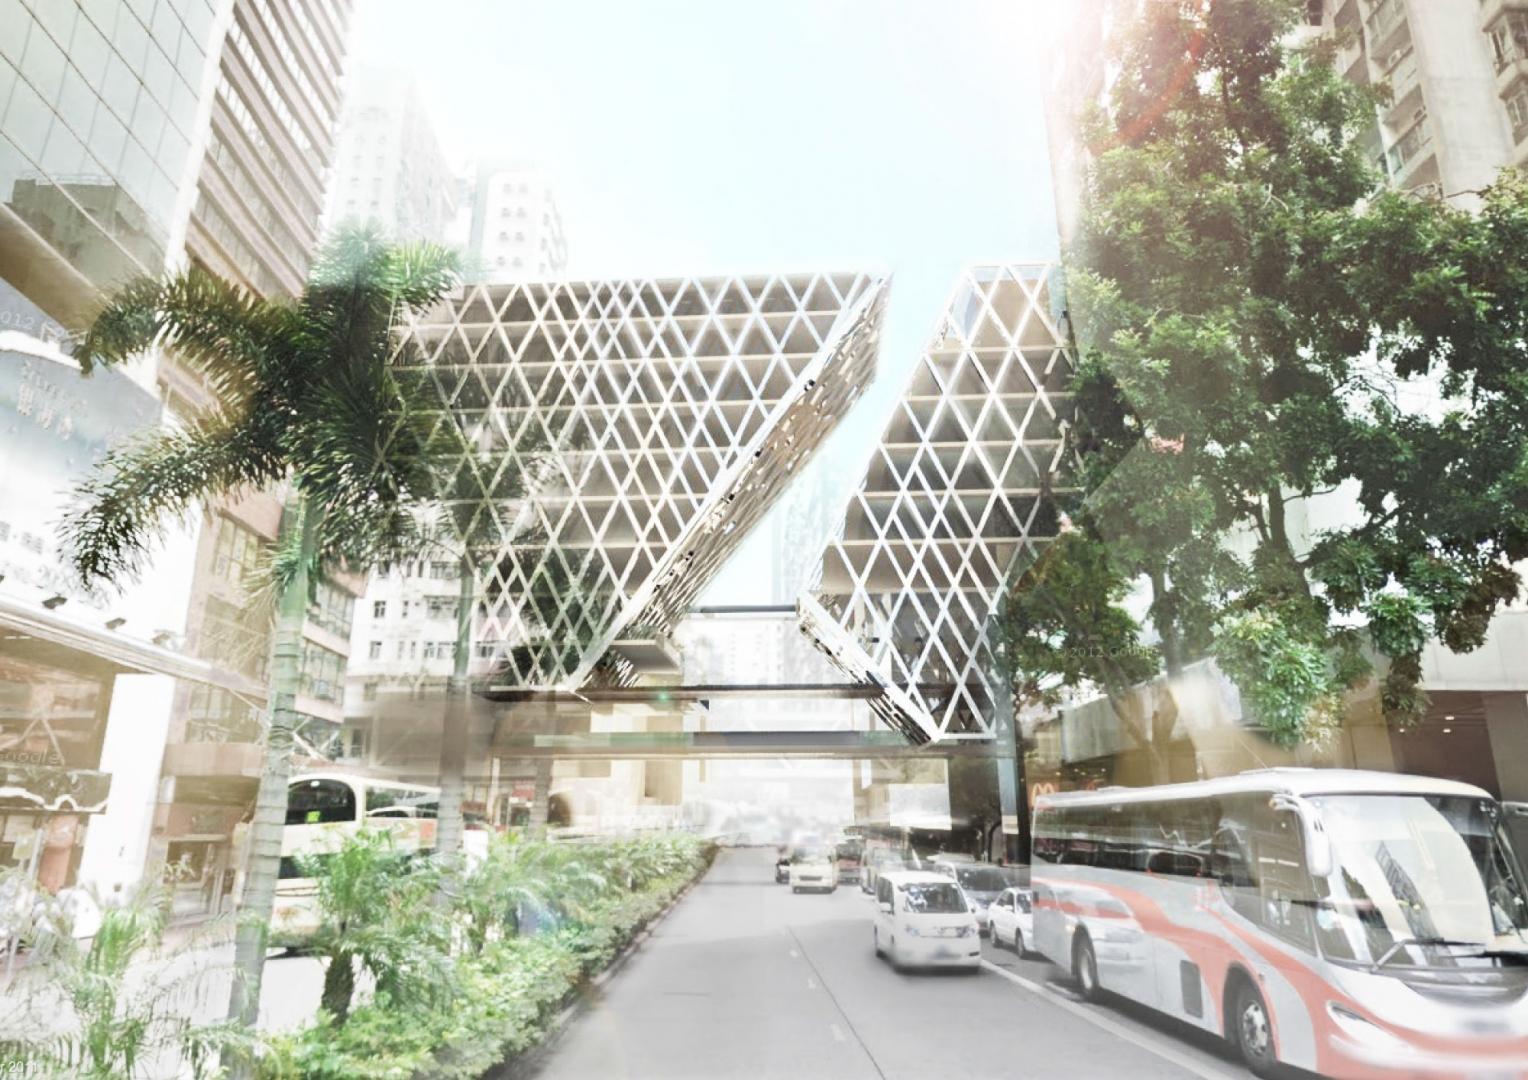 urban architecture parasite arch spine fabric dense hku iii